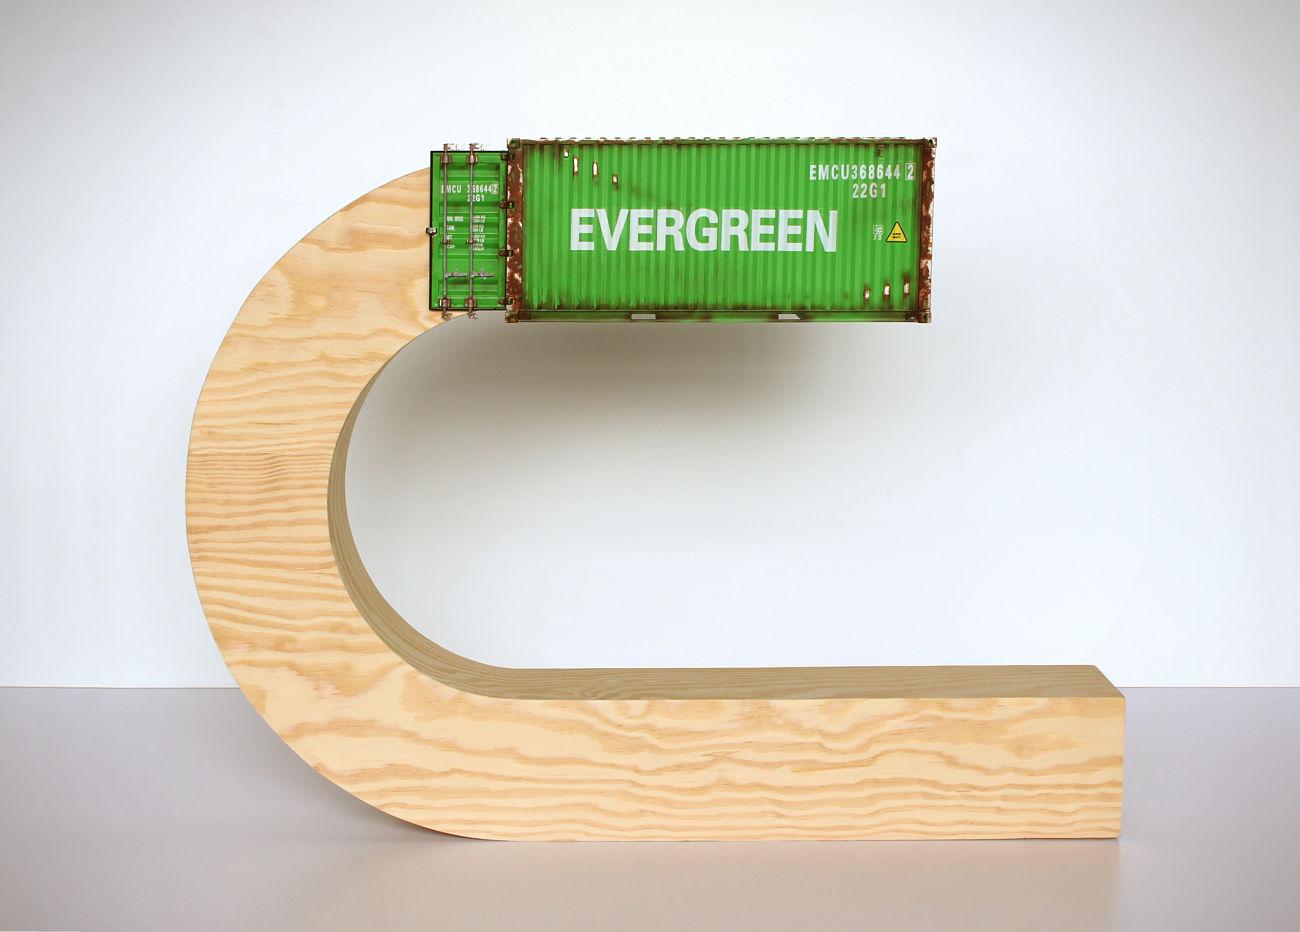 evergreen-ensamble_madera_plastico_y_acrilicos-55x70x12cm_opt.jpg